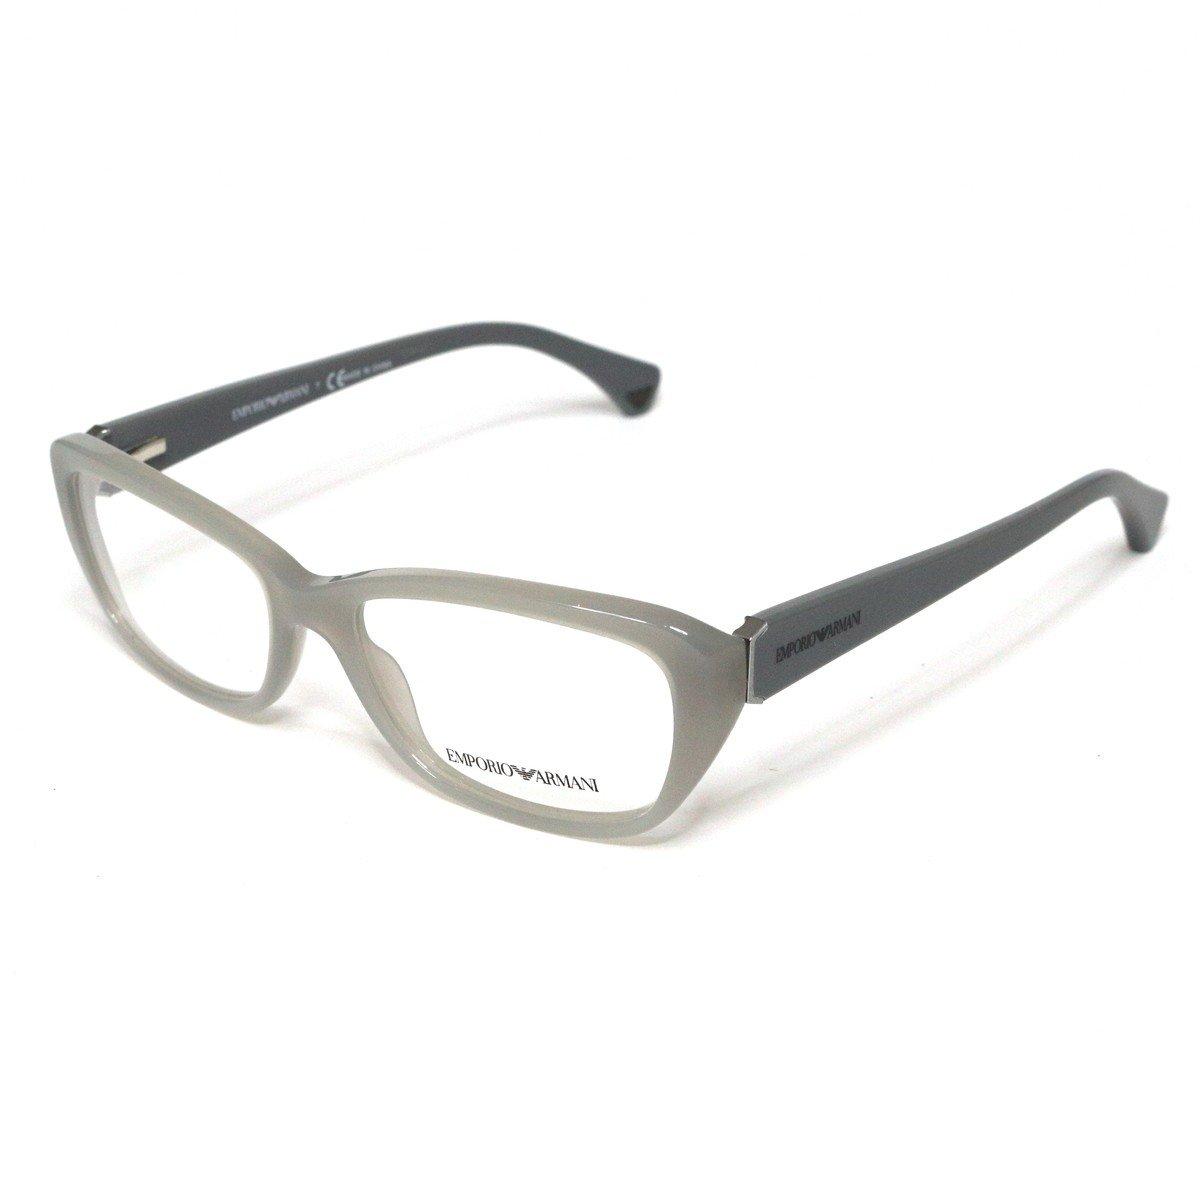 Emporio Armani Women Gray Optical Eyeglasses Frame EA3041 5258 55mm New w/ Case